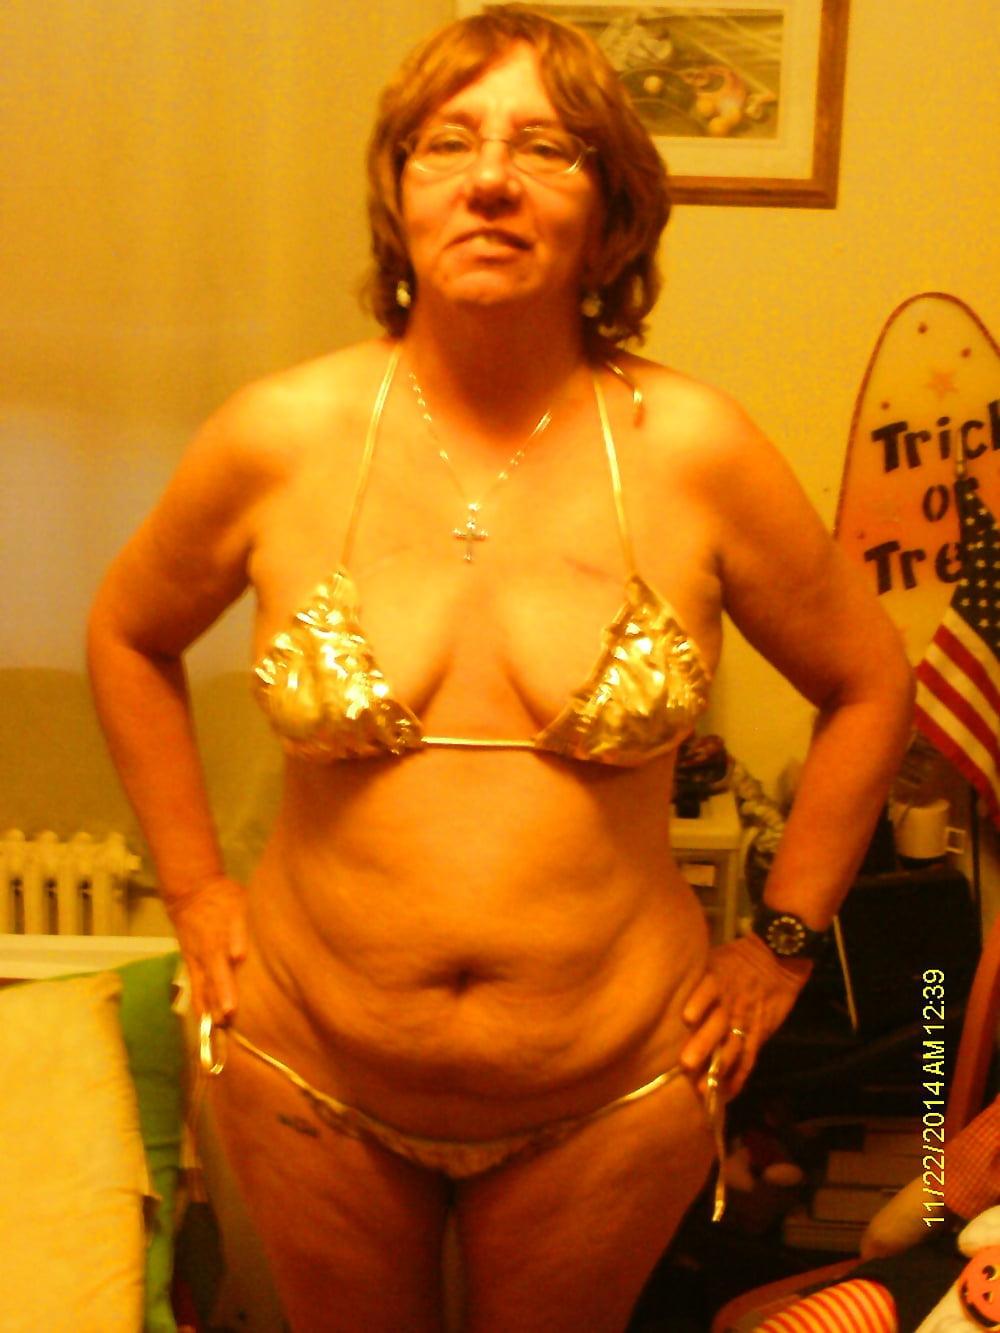 White and gold bikini